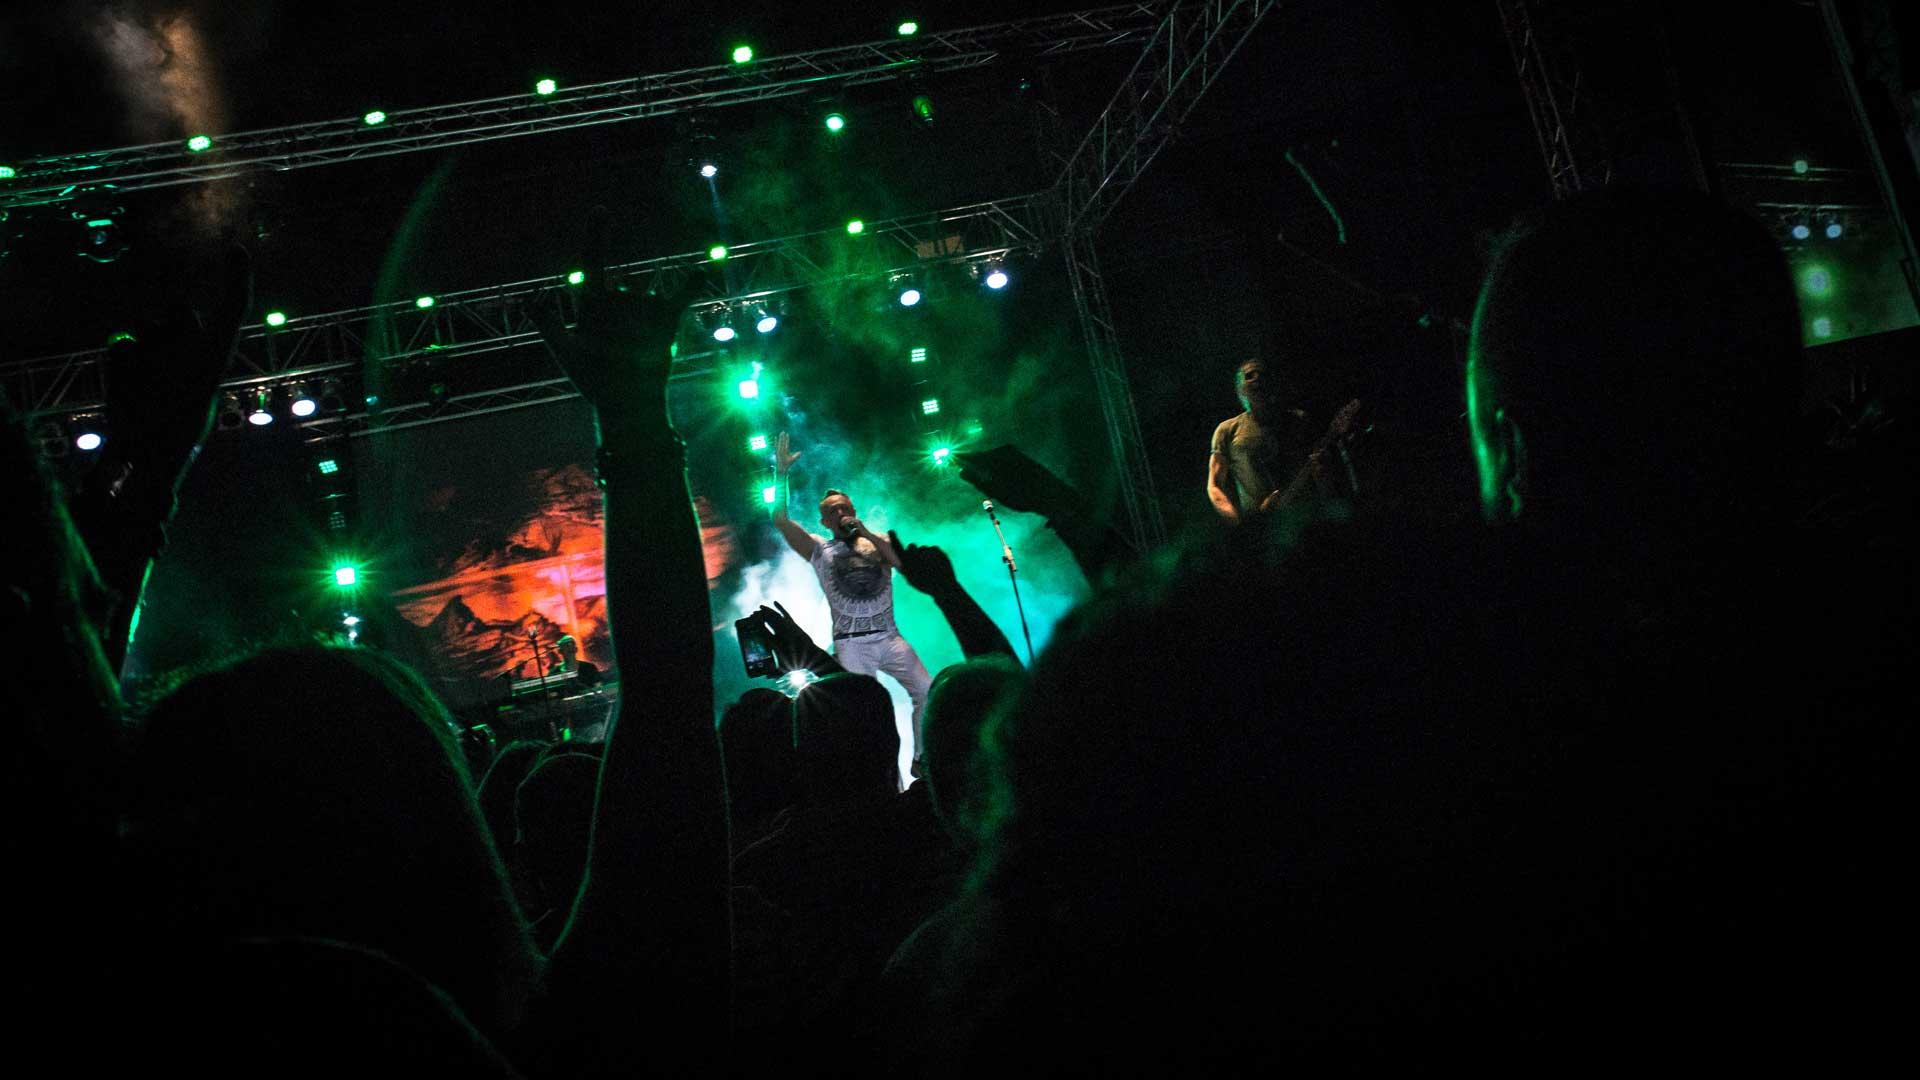 starfest80-45 Spots & Eventos Corporativos - video boda cadiz